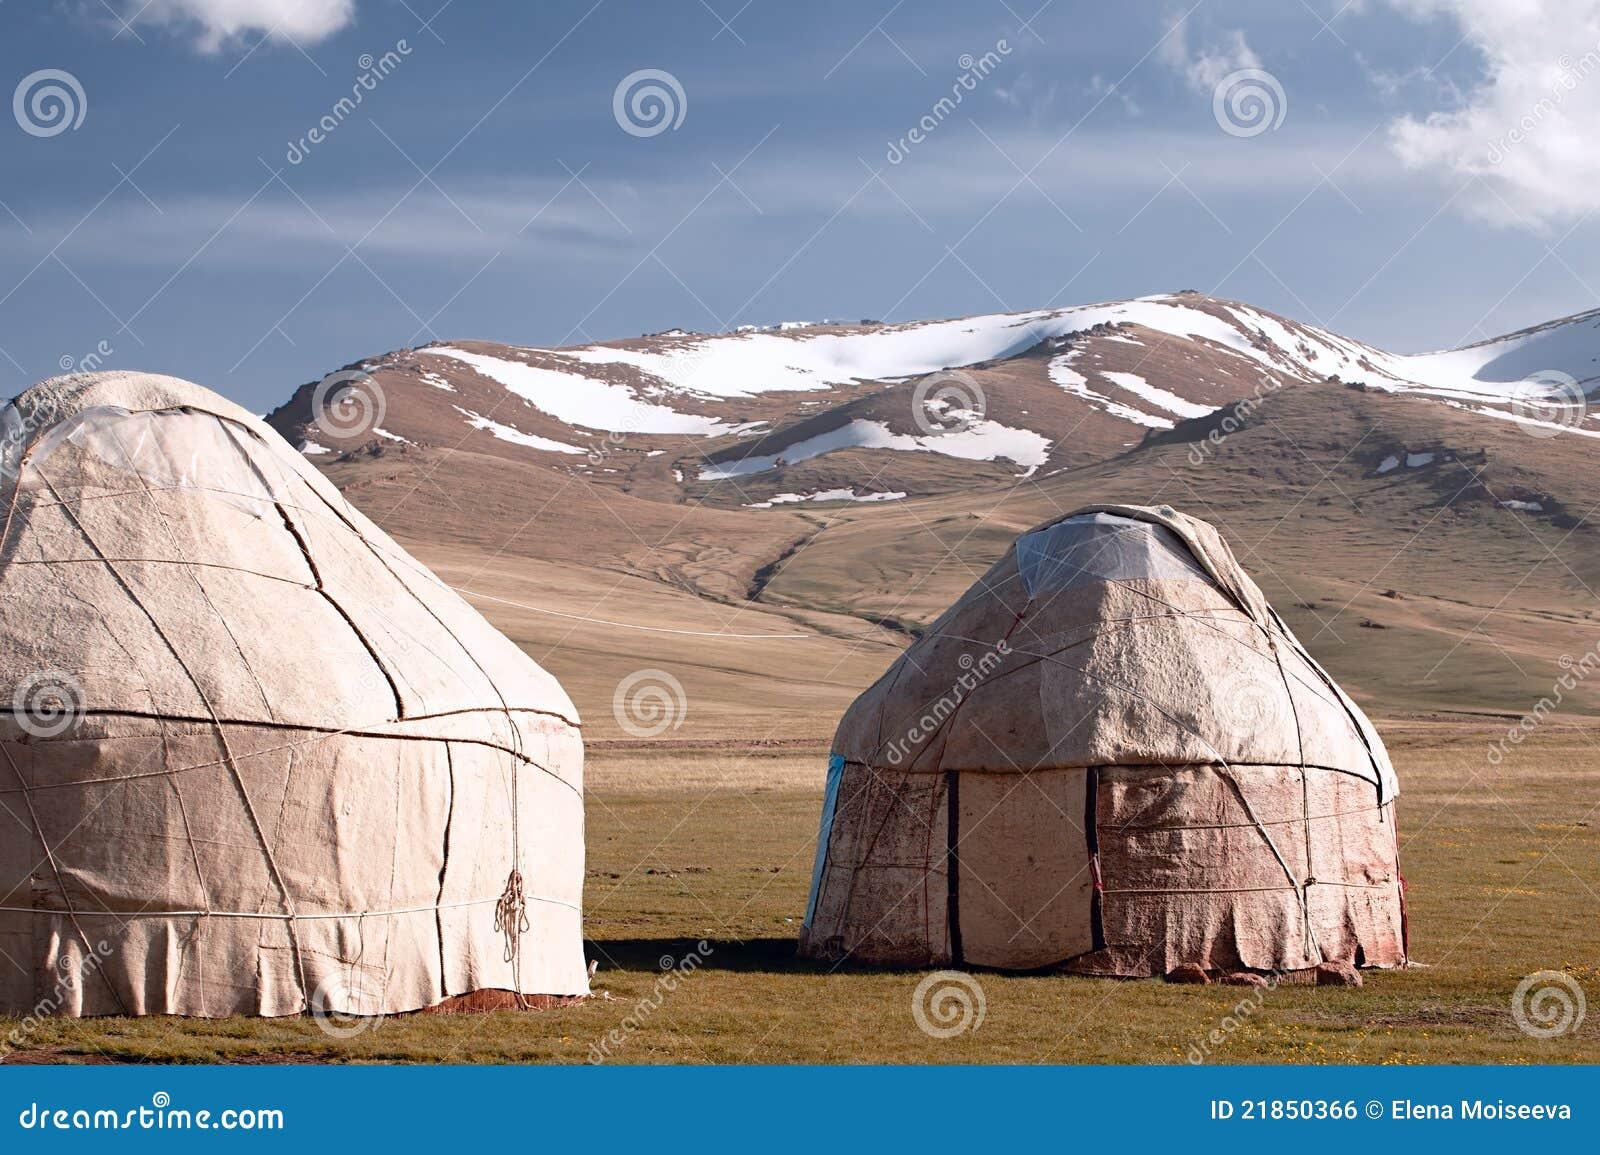 Shepherd yurt in kyrgyzstan Tien Shan mountain